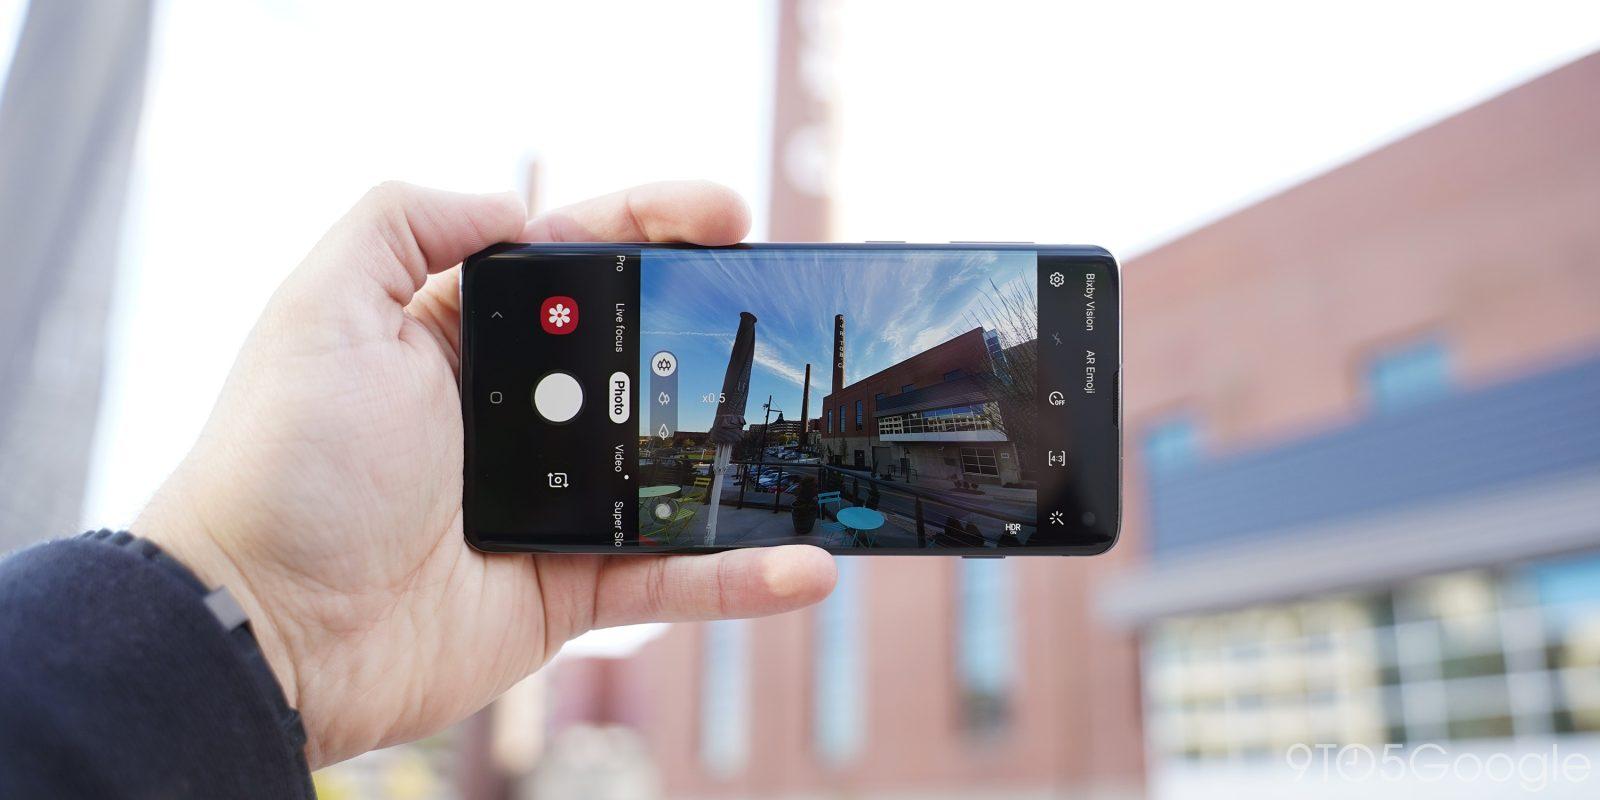 Samsung Galaxy S10 gets Night mode in camera update - 9to5Google